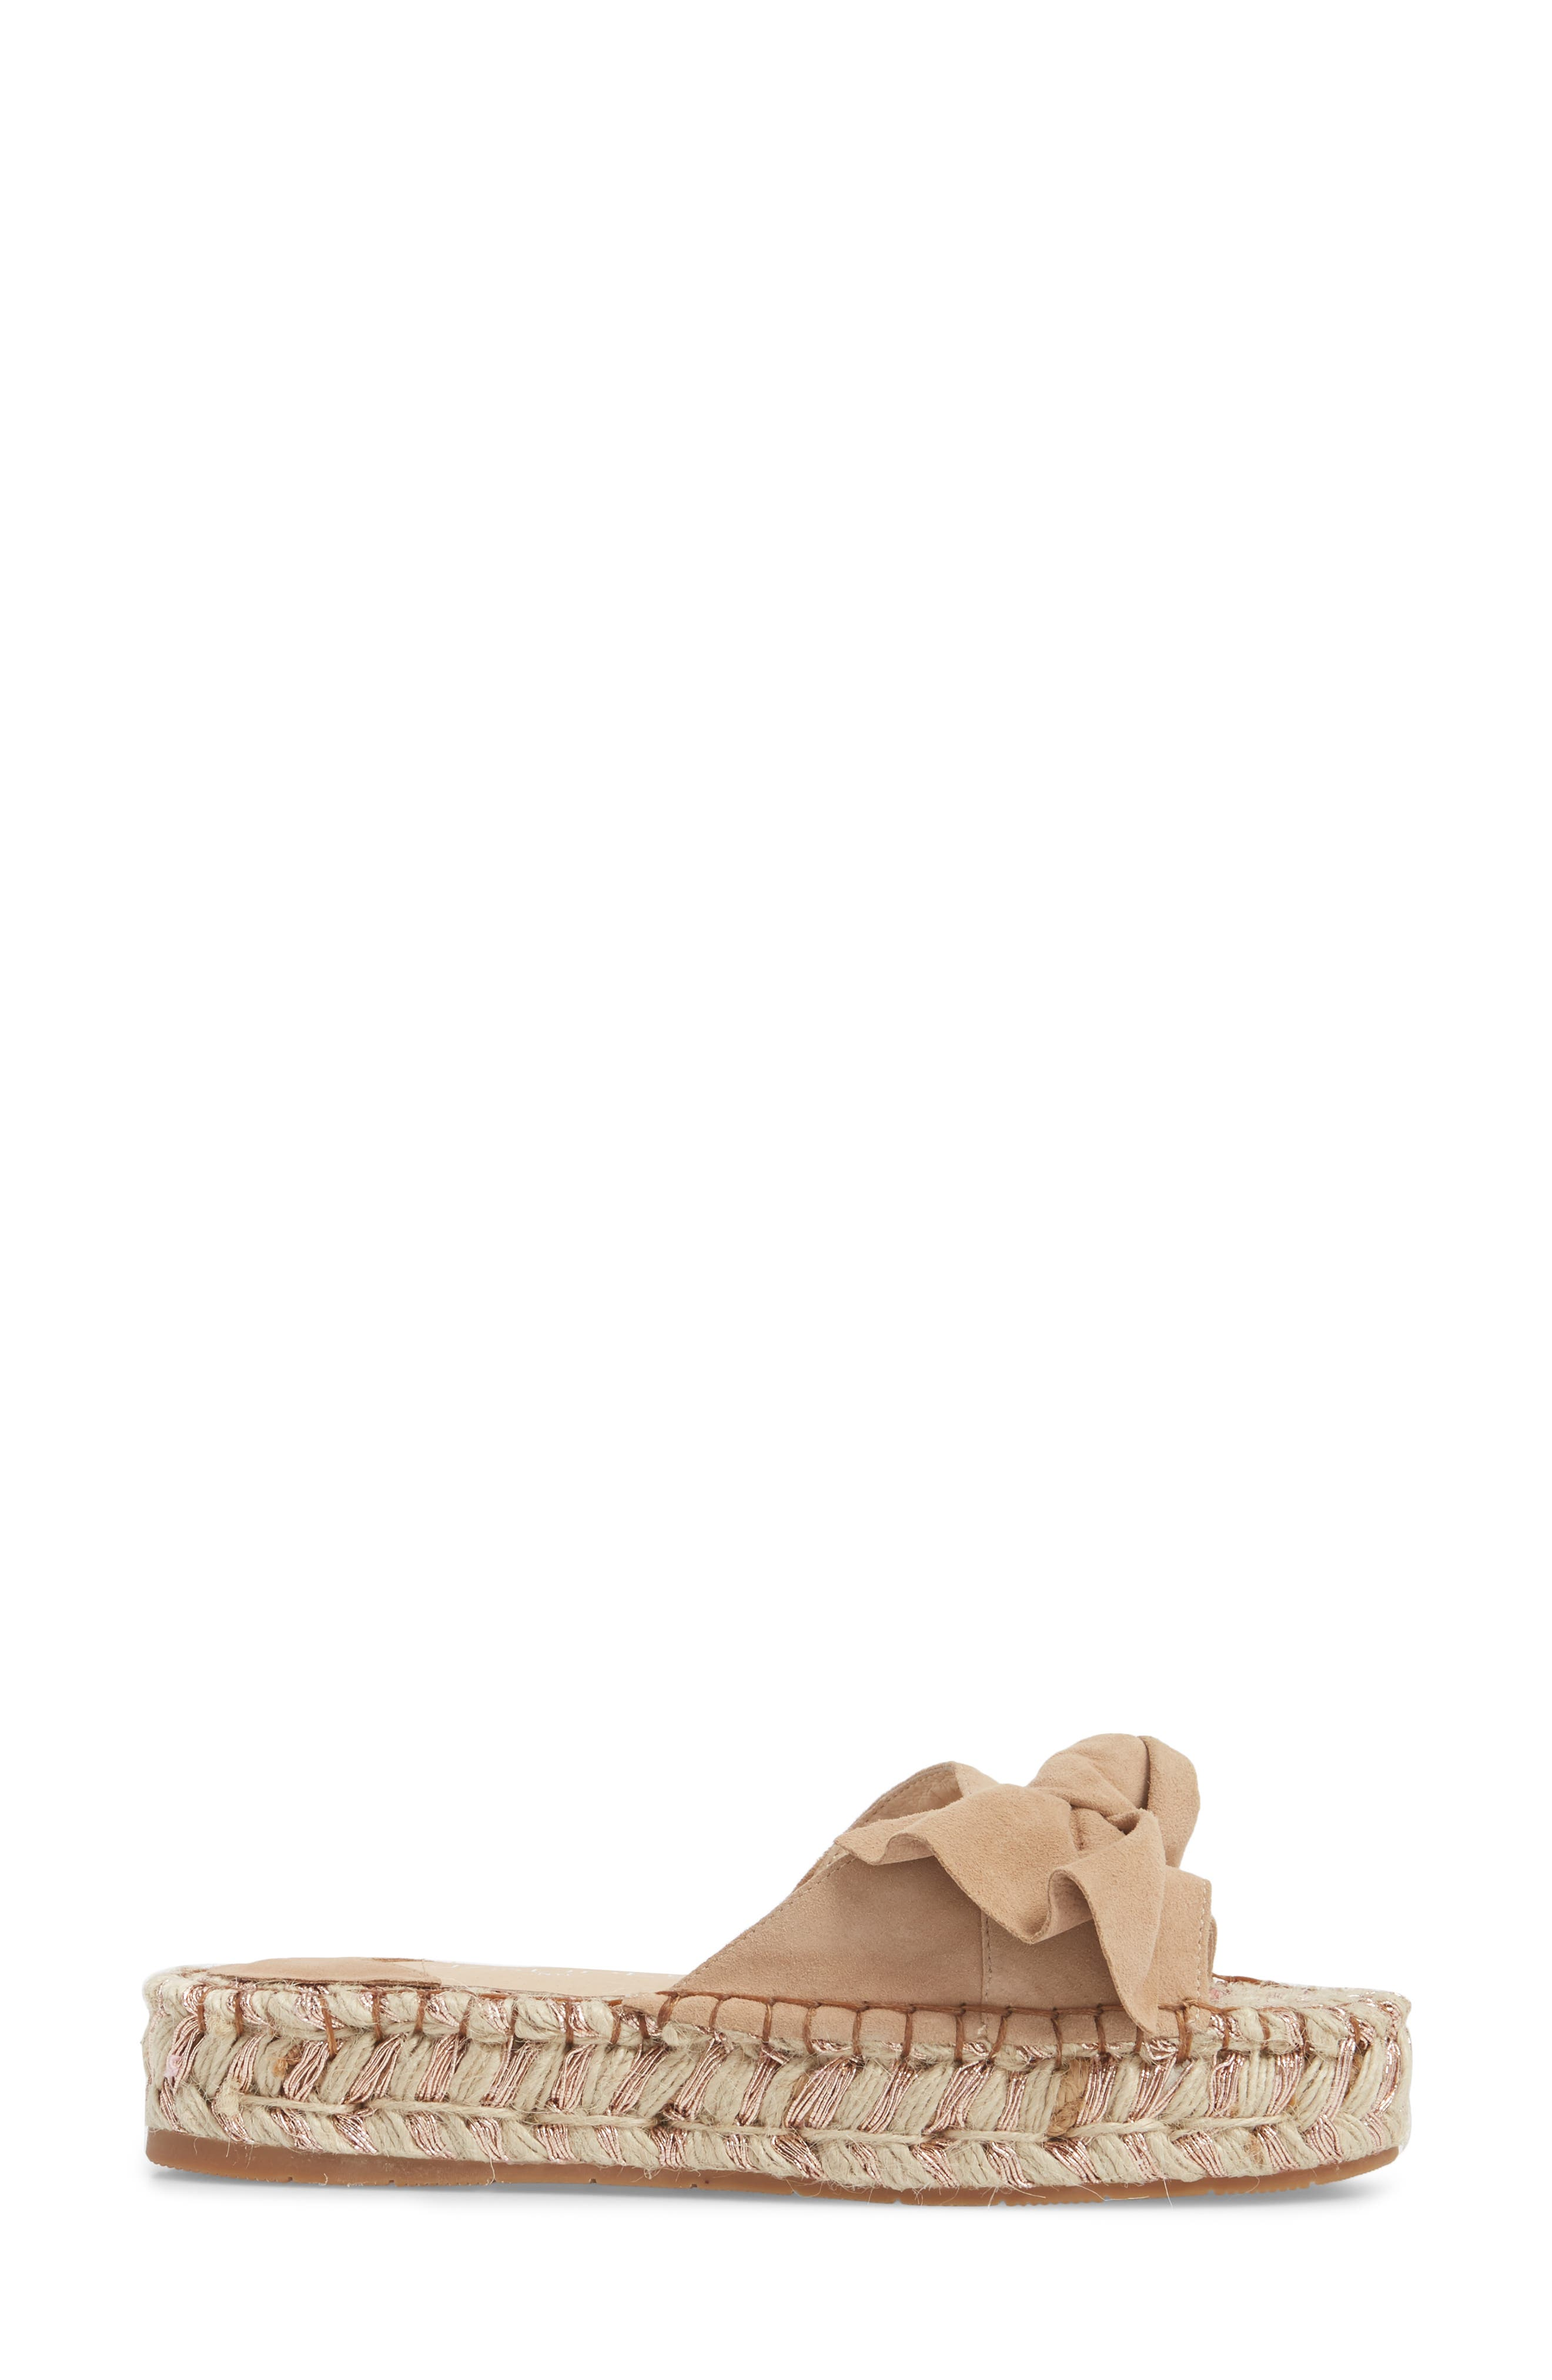 JSLIDES,                             Ritsy Espadrille Slide Sandal,                             Alternate thumbnail 3, color,                             200